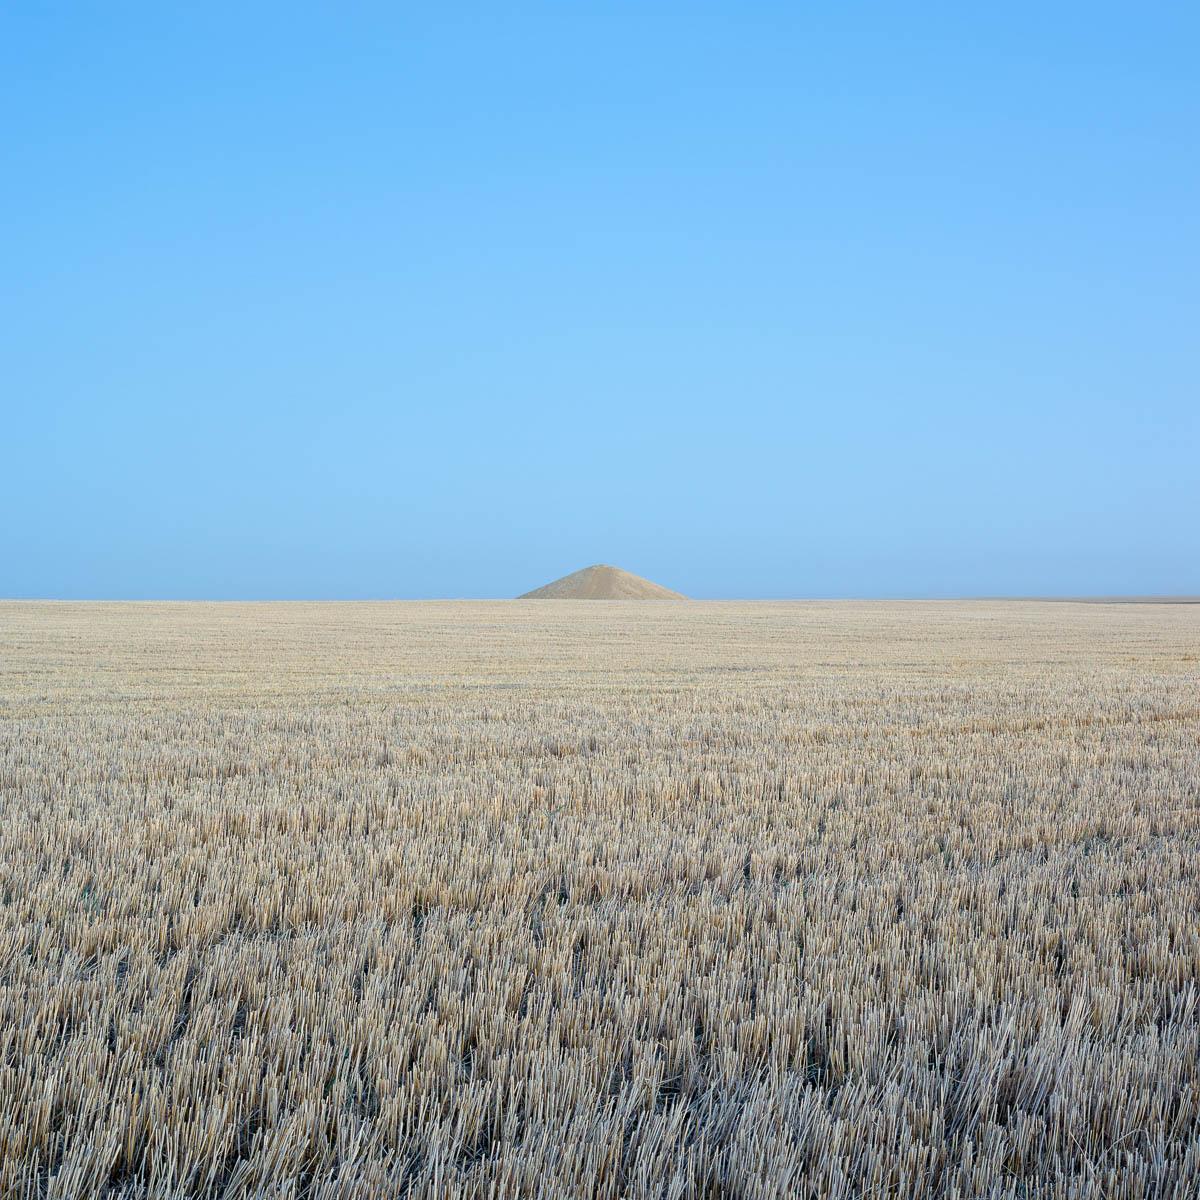 Pyramid, Alberta, 2005